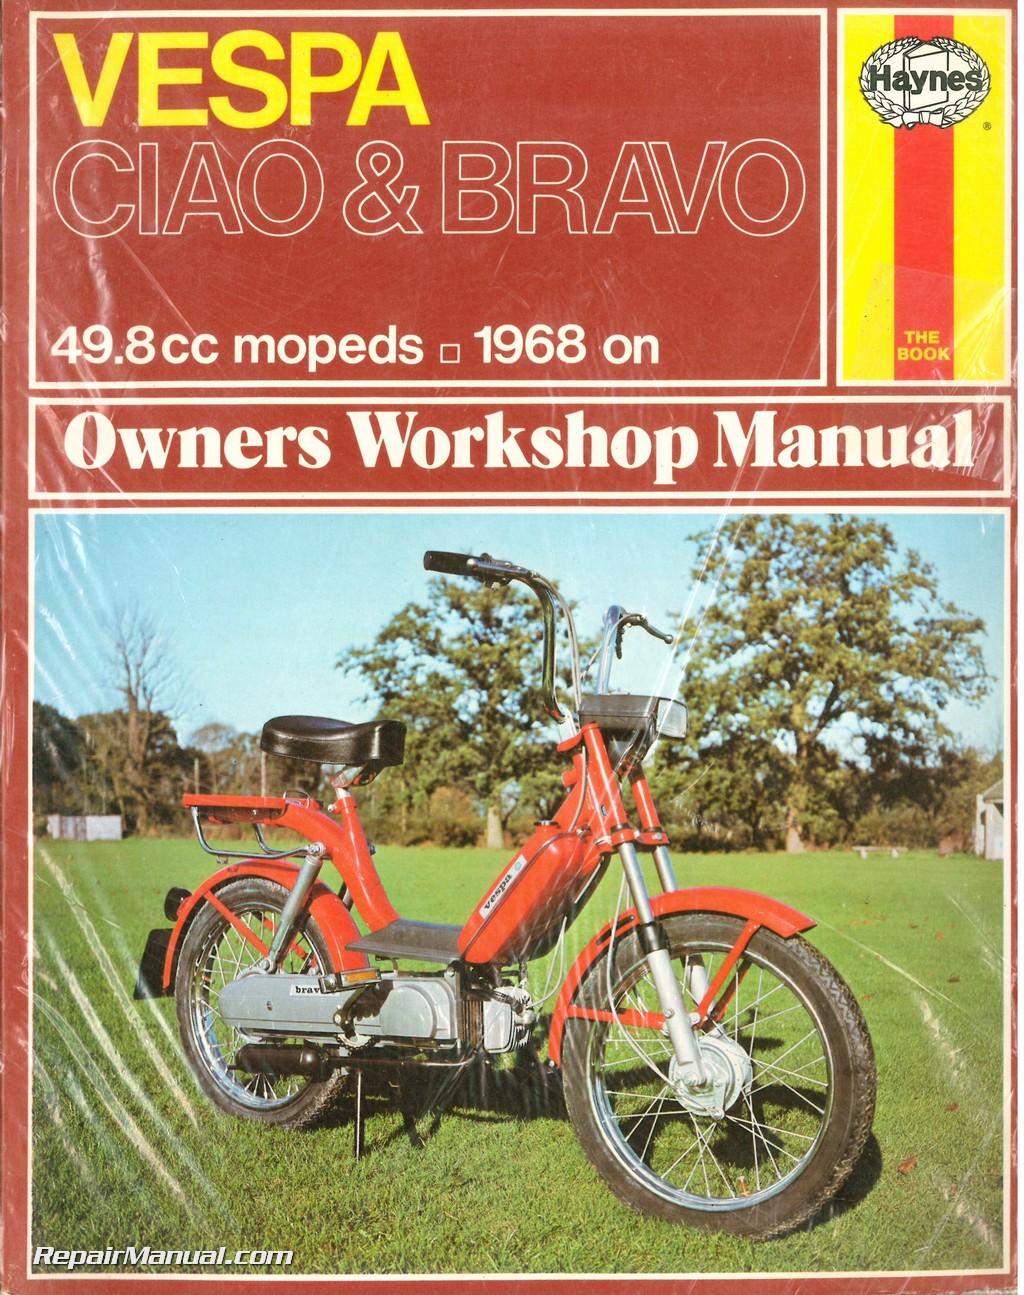 vespa ciao bravo 49cc moped owner s workshop manual 1968 on rh repairmanual com Vespa Bravo Parts Vespa Seat Bravo